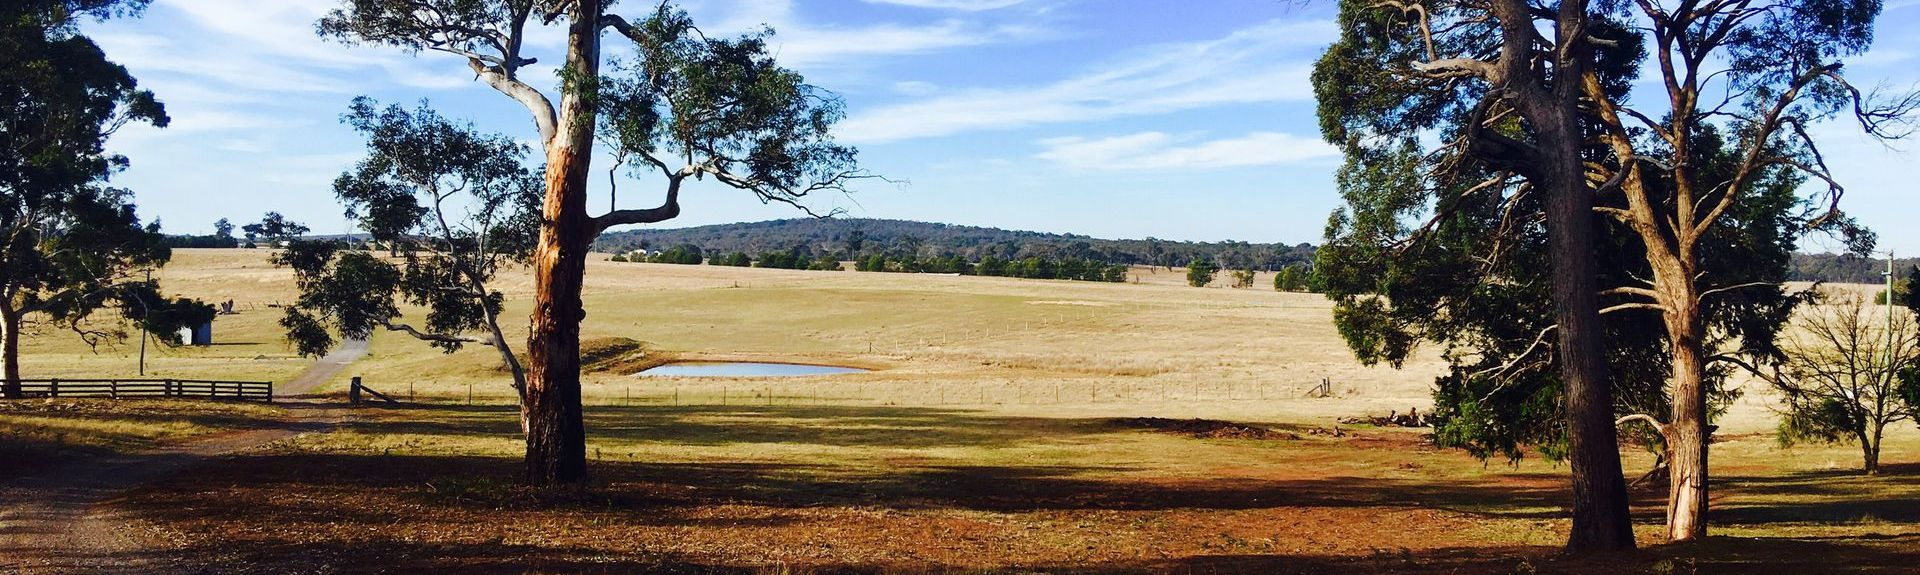 Marulan, New South Wales, Australië